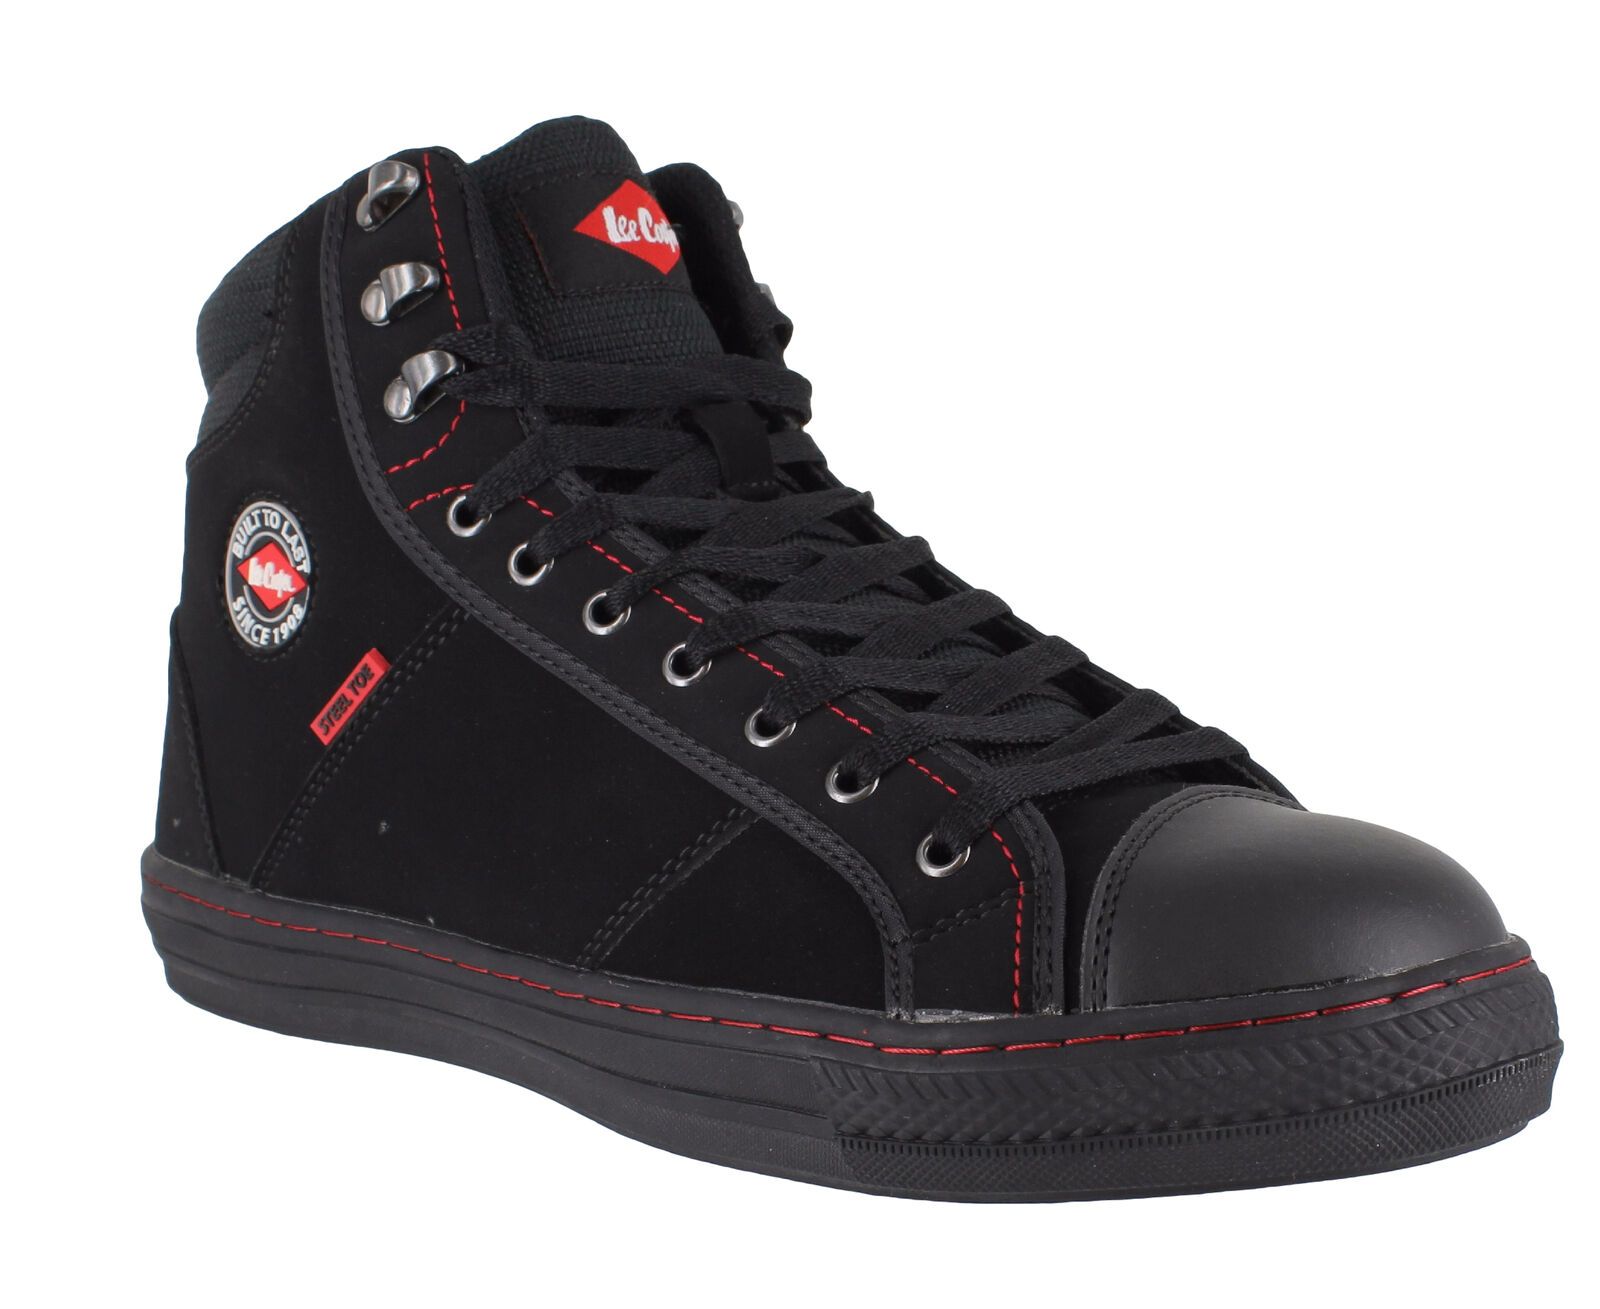 Lee Cooper 022 Unisex Black SB Steel Toe Safety Retro Style High Hi Tops Boots